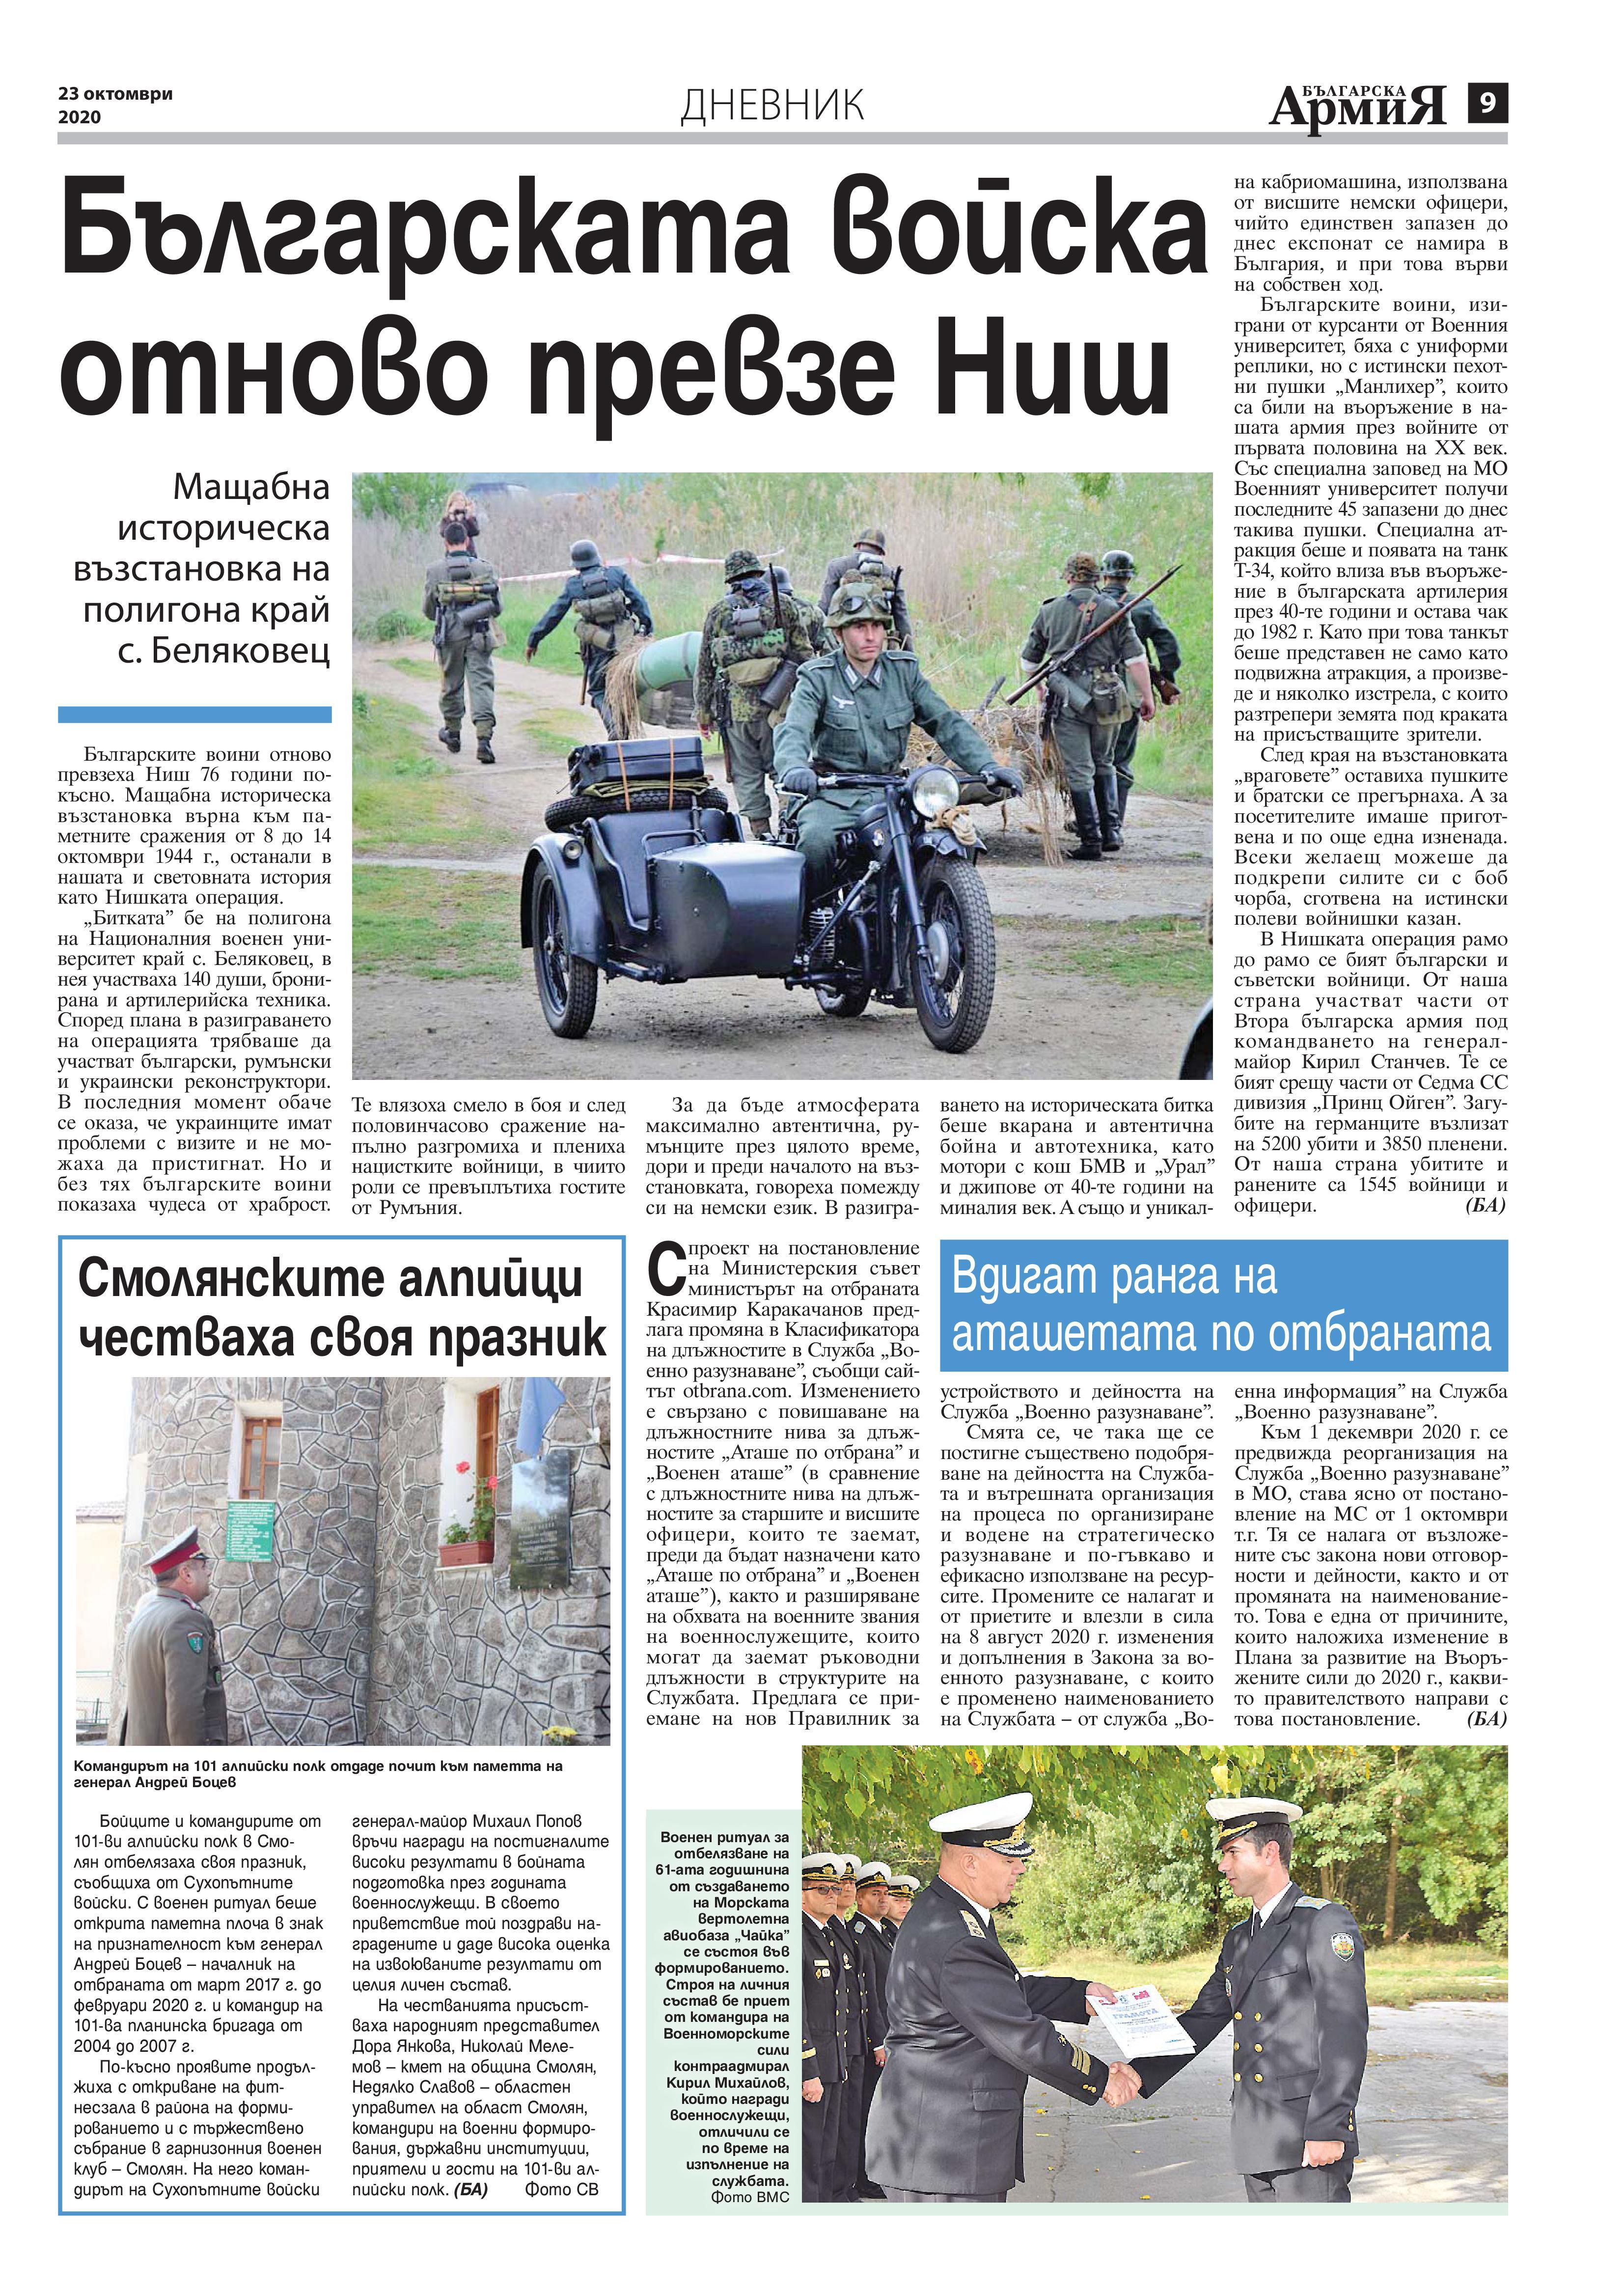 https://armymedia.bg/wp-content/uploads/2015/06/09-44.jpg